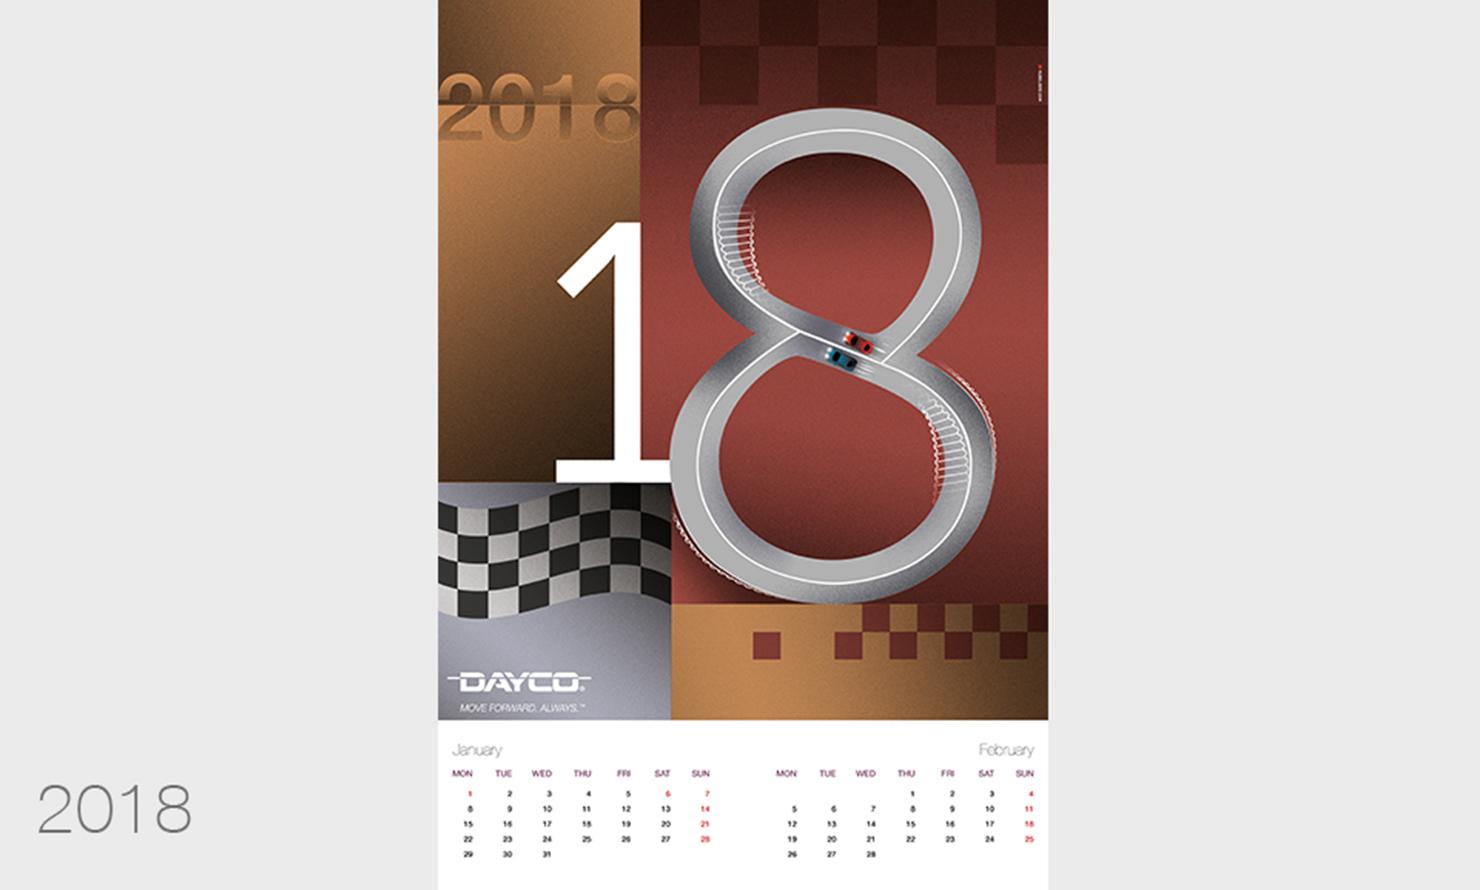 https://www.kubelibre.com/uploads/Slider-work-tutti-clienti/dayco-calendario-2018-1.jpg